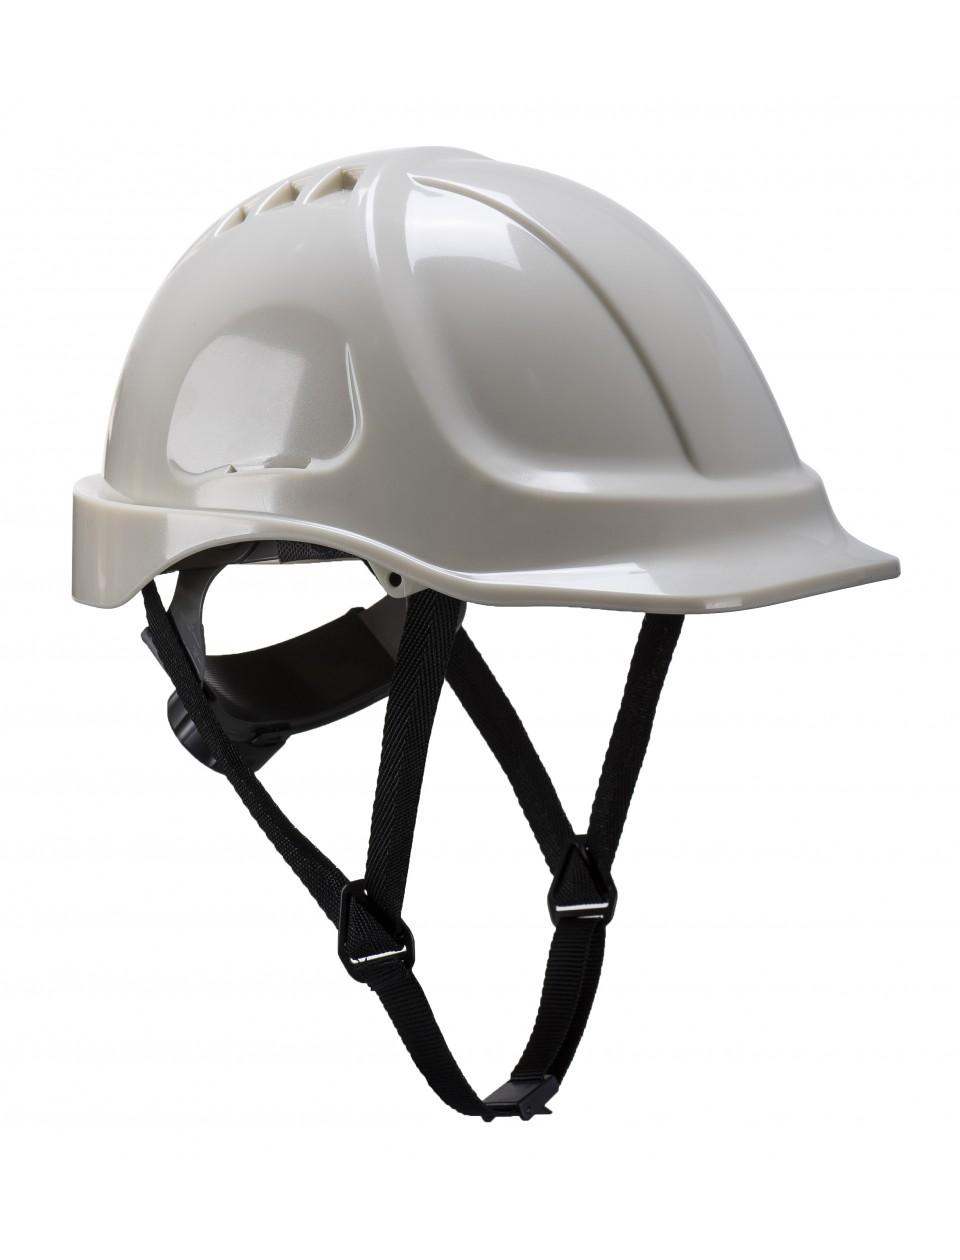 Portwest PG54 Glow-In-The-Dark Helmet Personal Protective Equipment